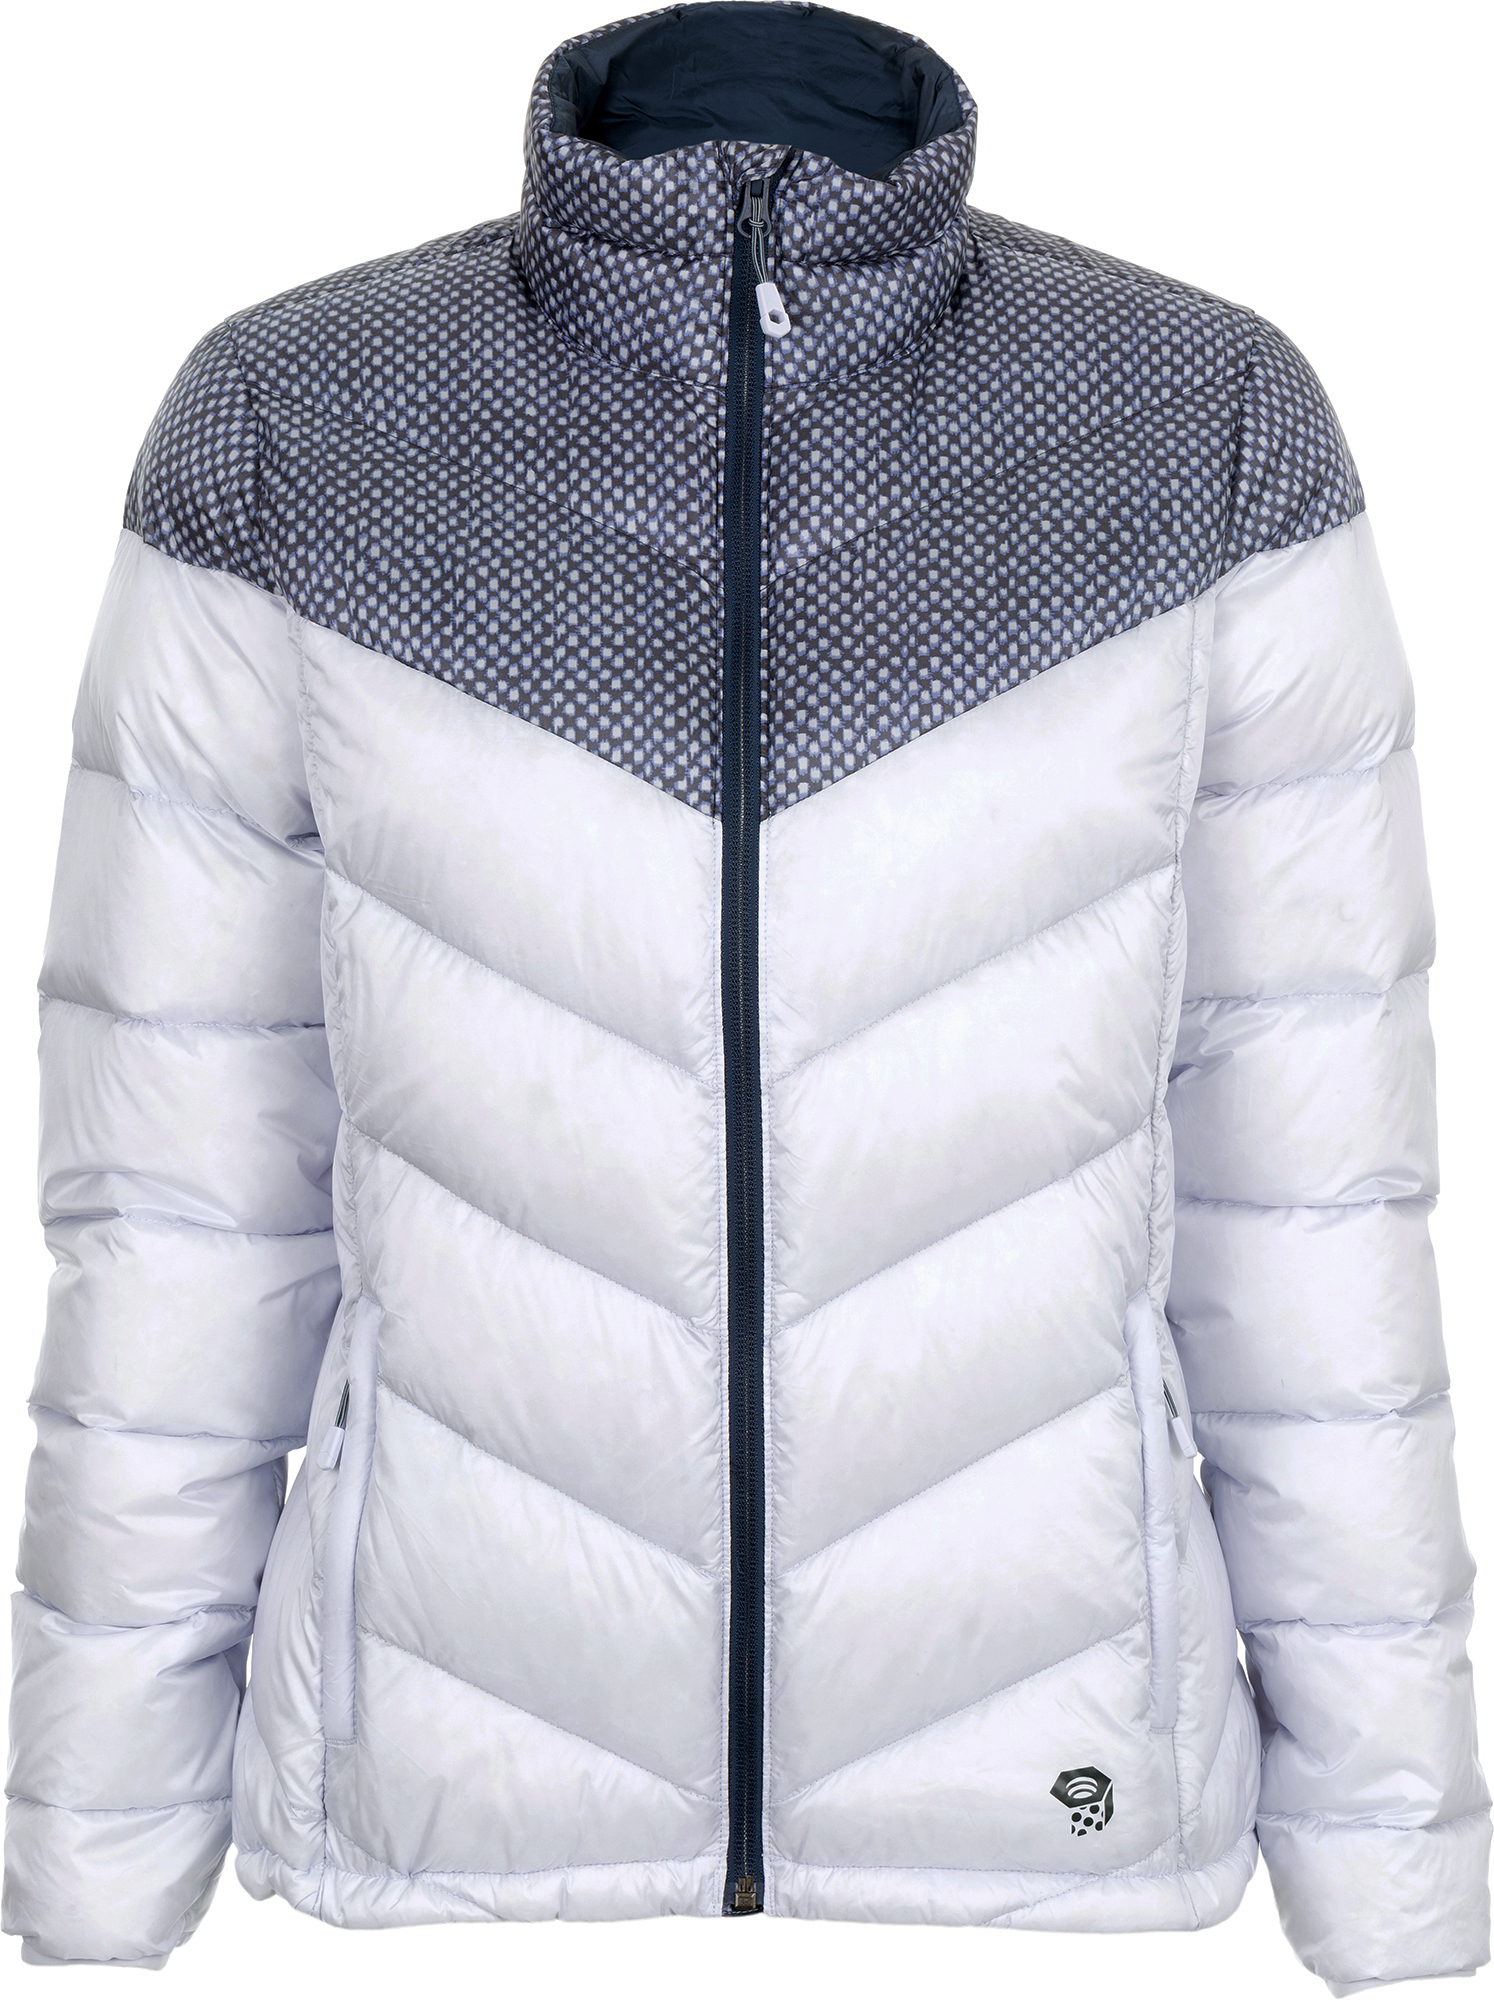 Mountain Hardwear Куртка пуховая женская Mountain Hardwear Ratio, размер 48 цена